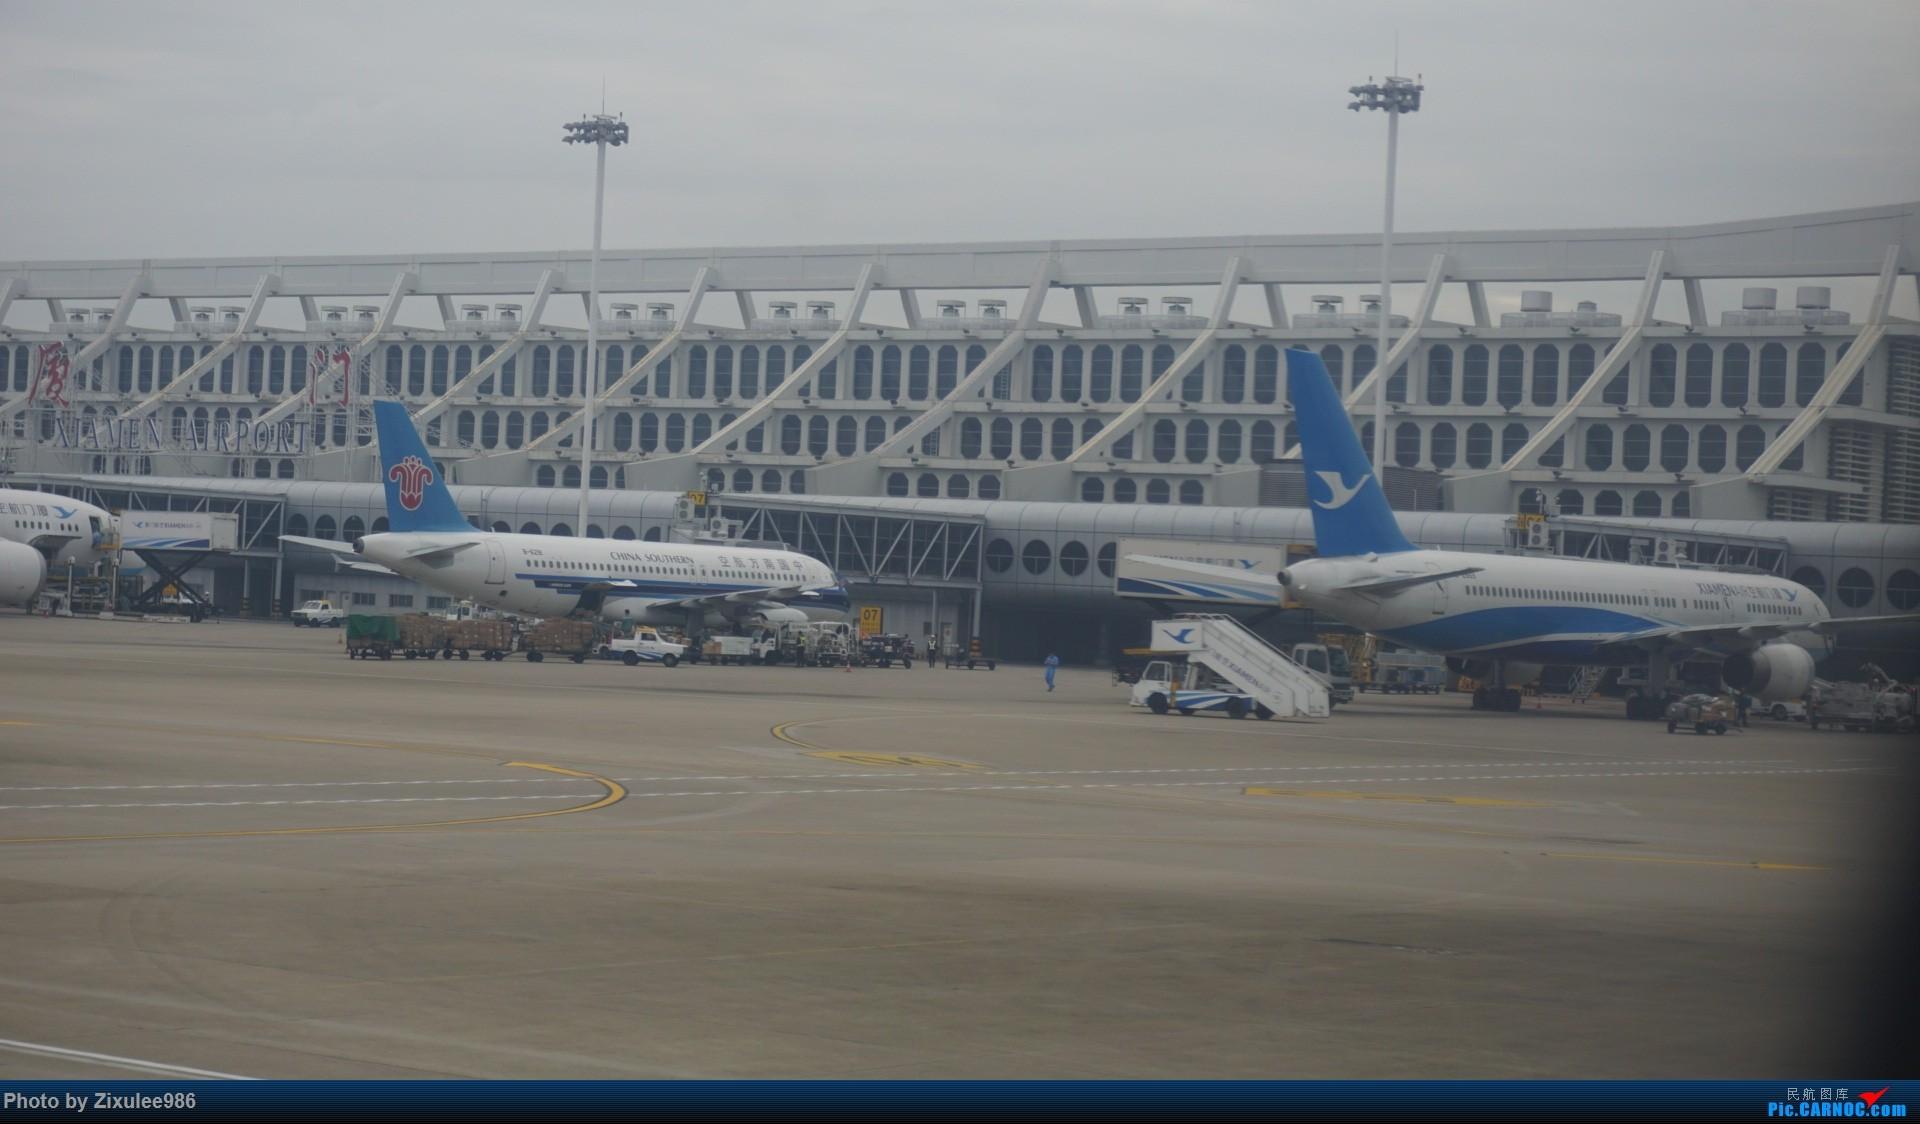 Re:[原创][XMN]寒假东北游随拍PART1--厦航篇~头一次拍752 BOEING 757-25C B-2869 中国厦门高崎国际机场